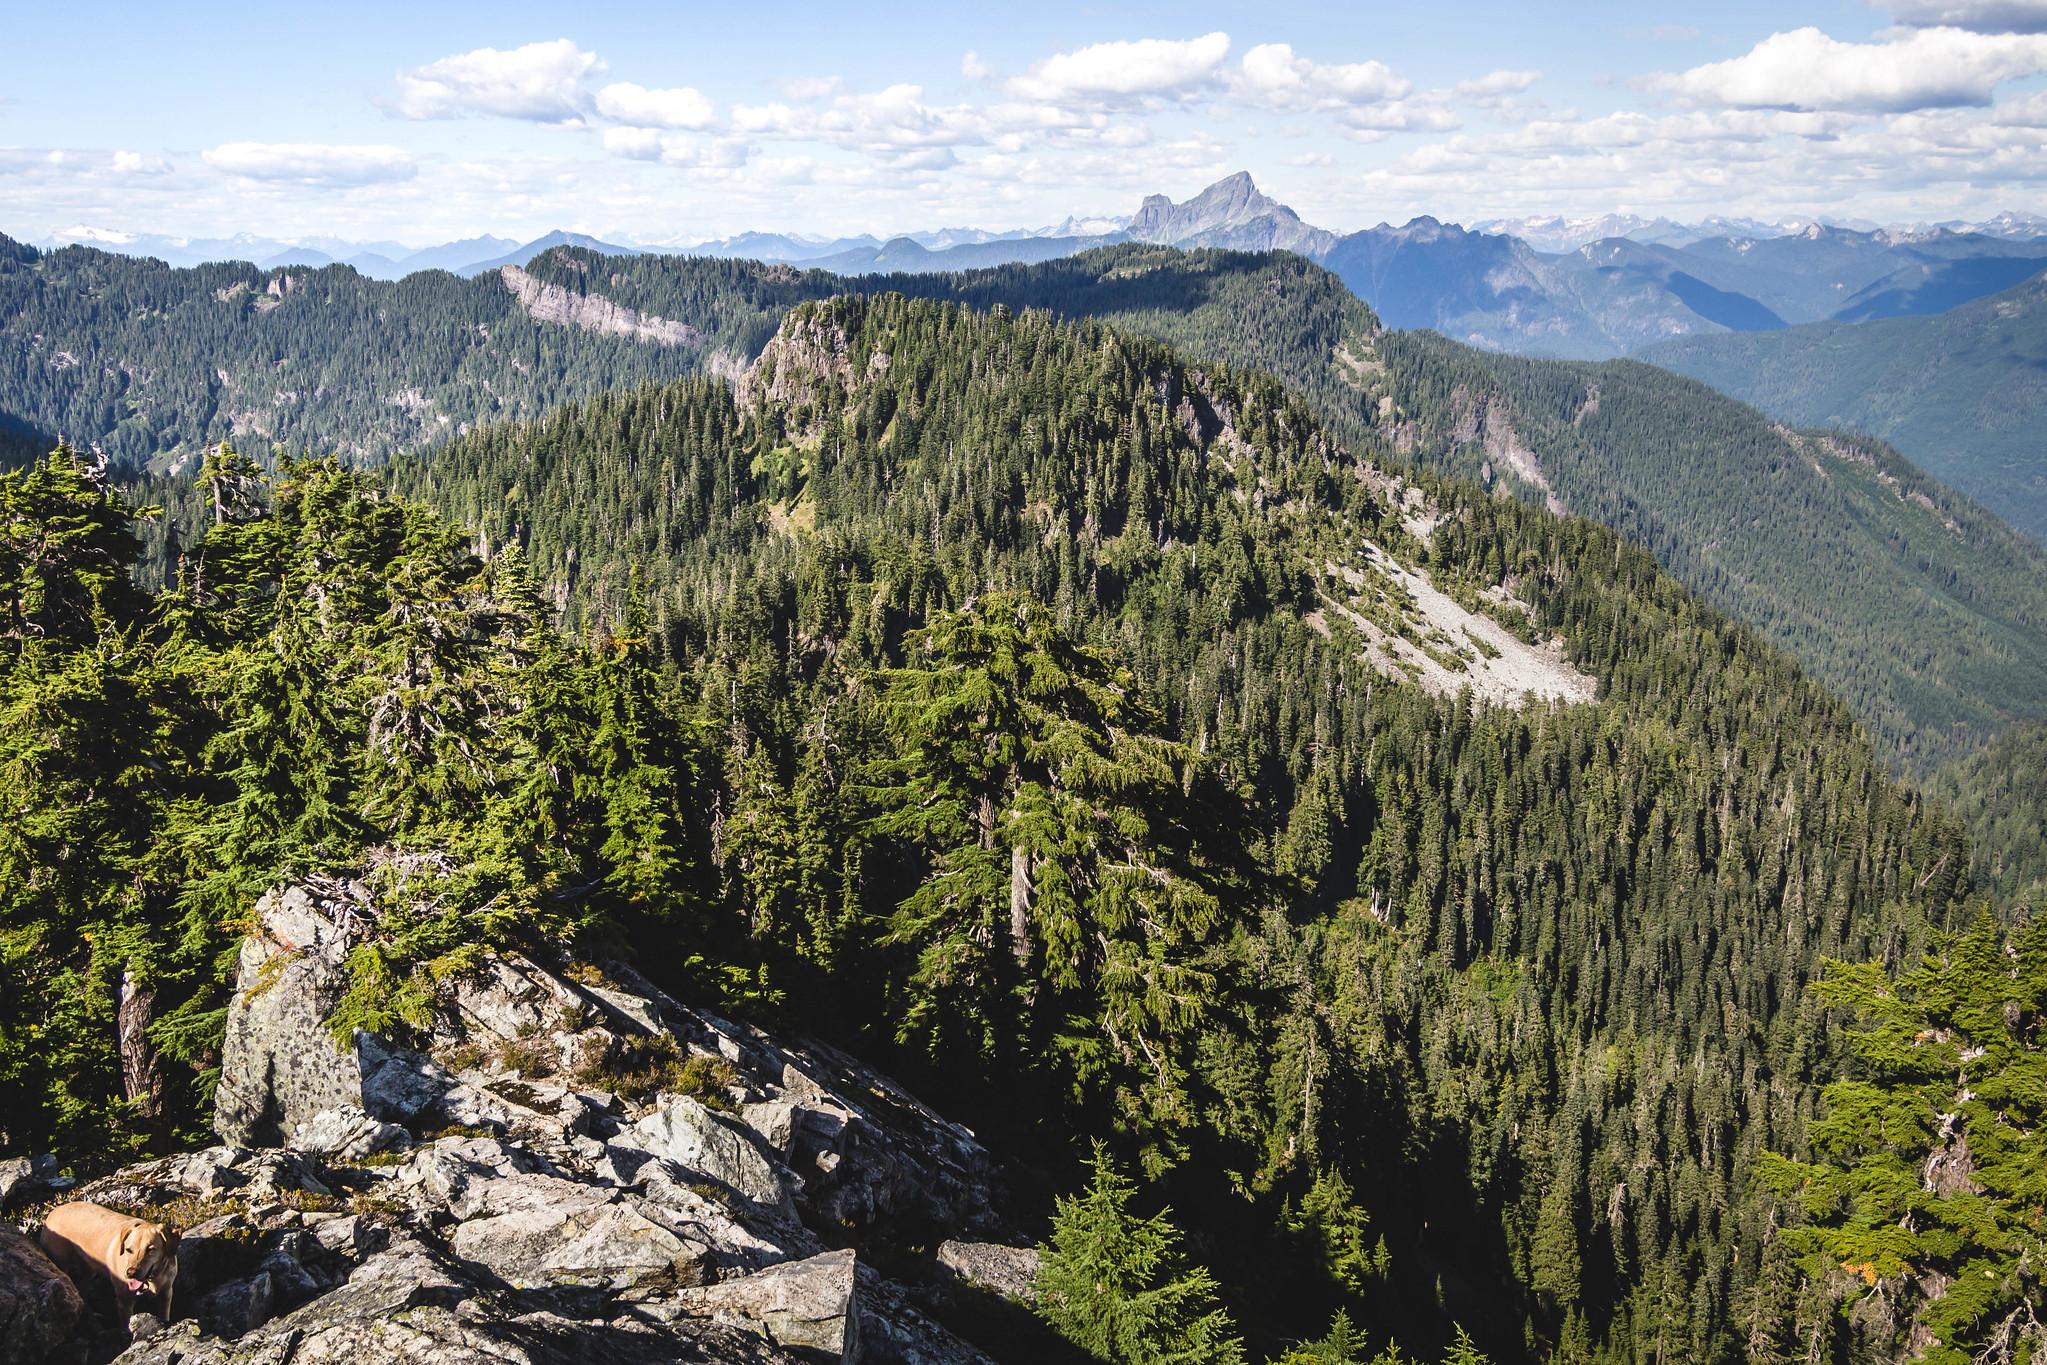 Next stop, Anthracite Peak